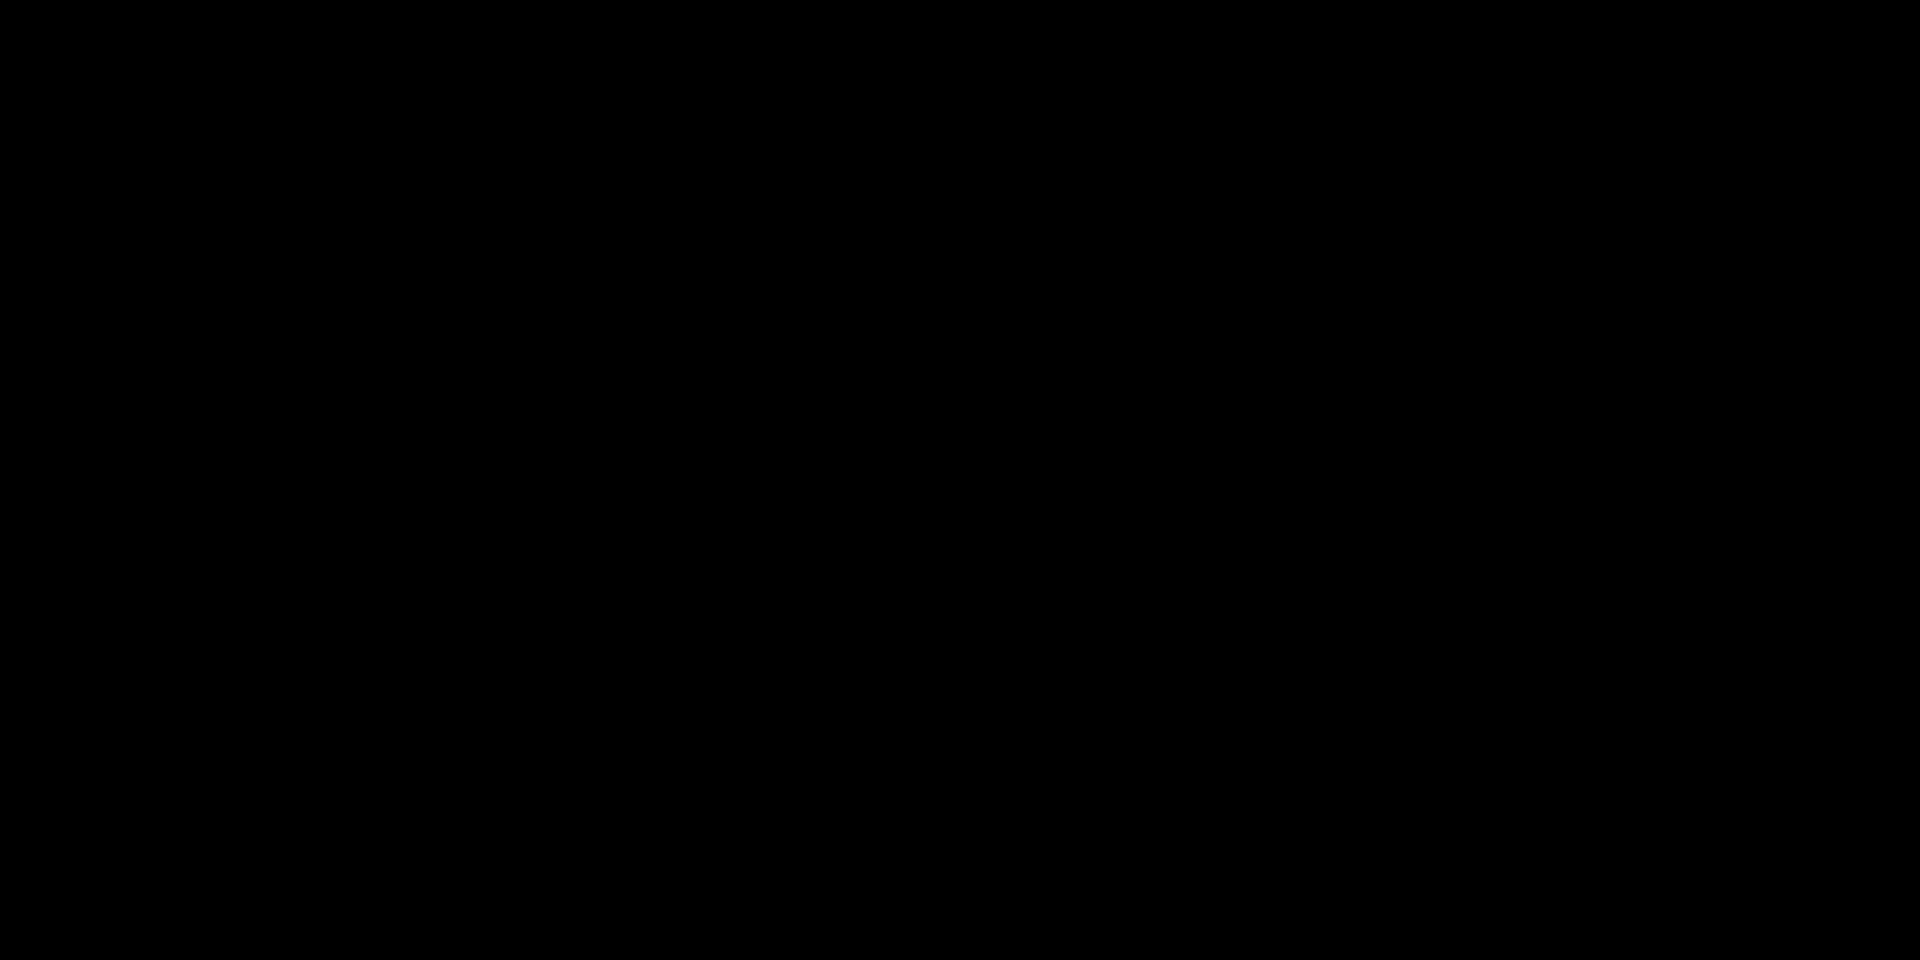 Bow tie Angle Line Font Black M.